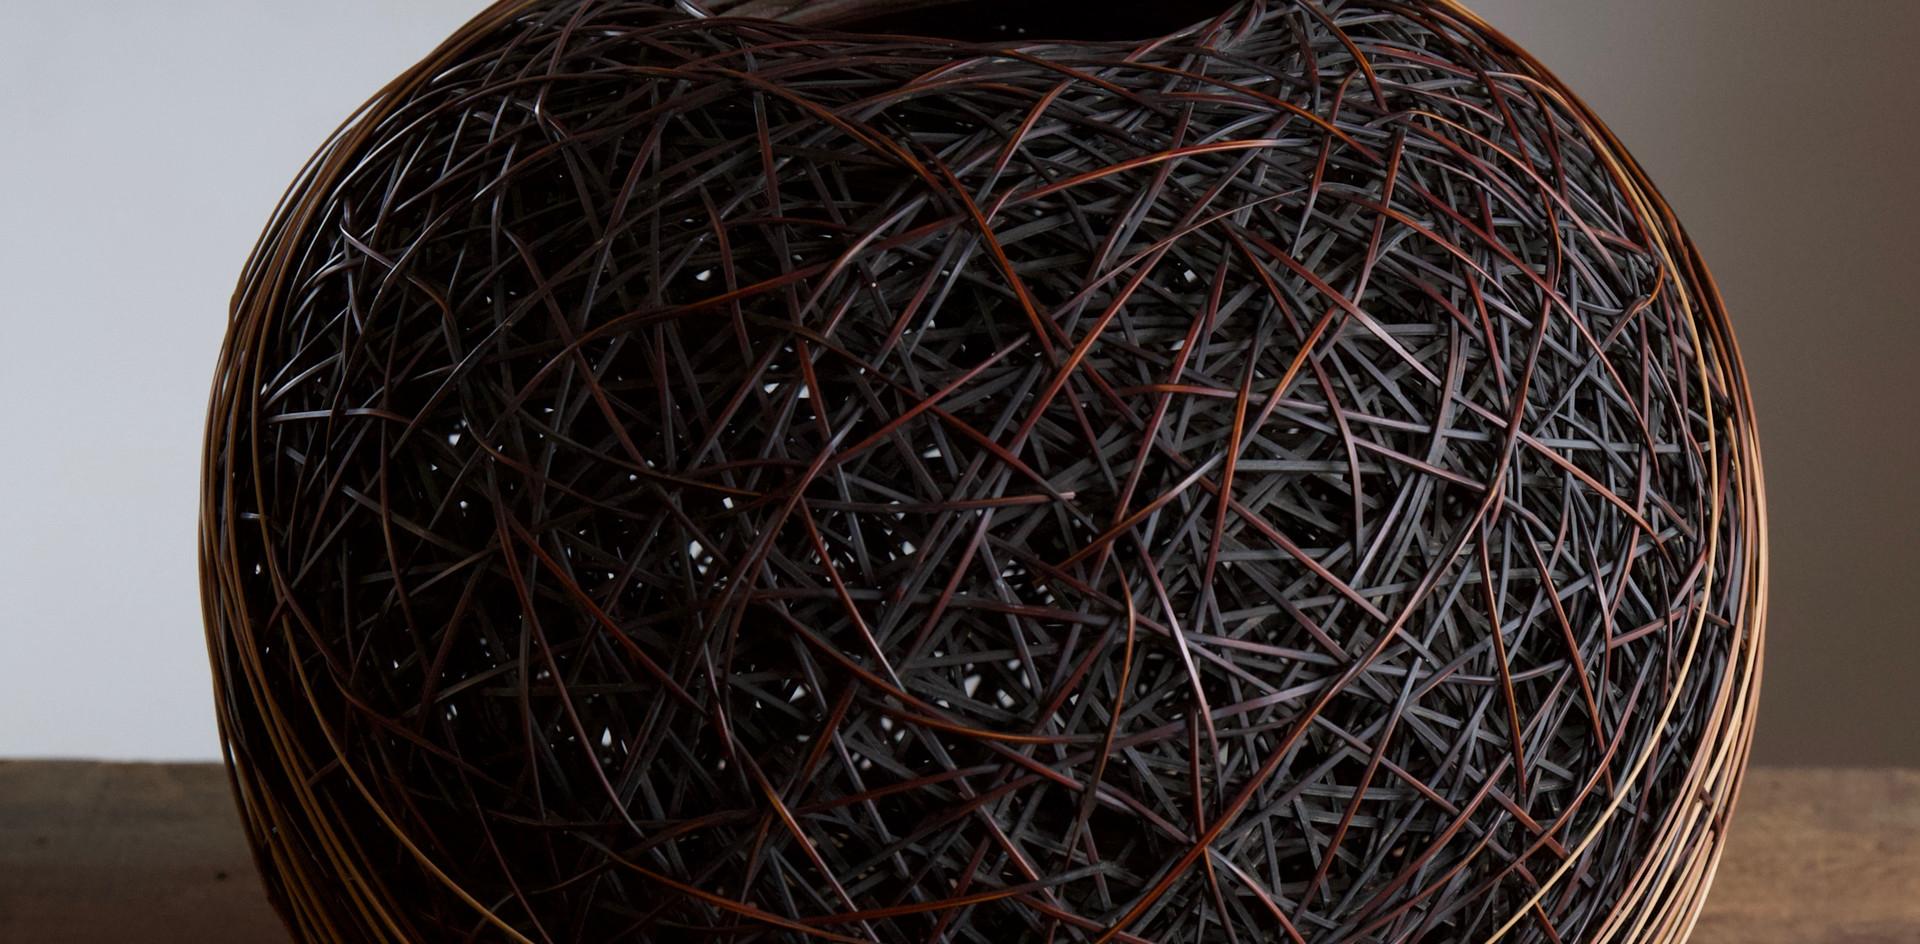 Monden Kogyoku Earth Flower Basket 04.jpg